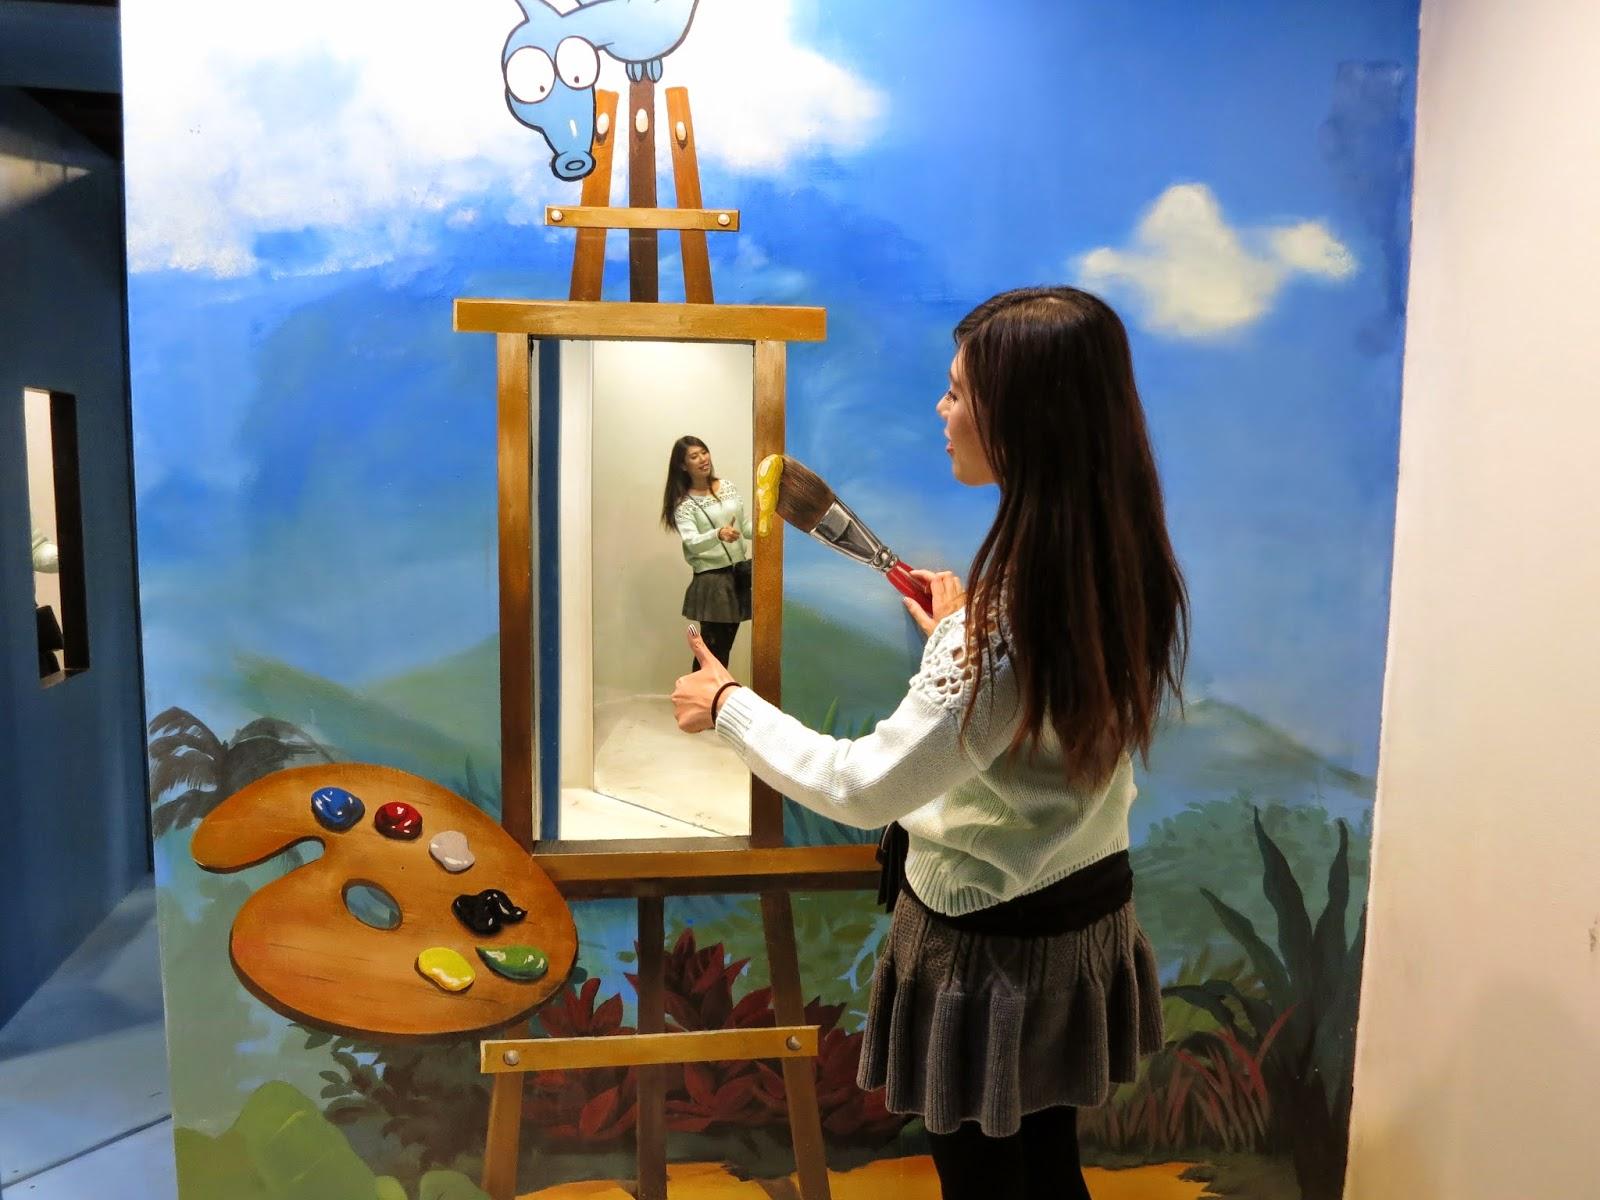 Alive Museum @ Insadong, Seoul